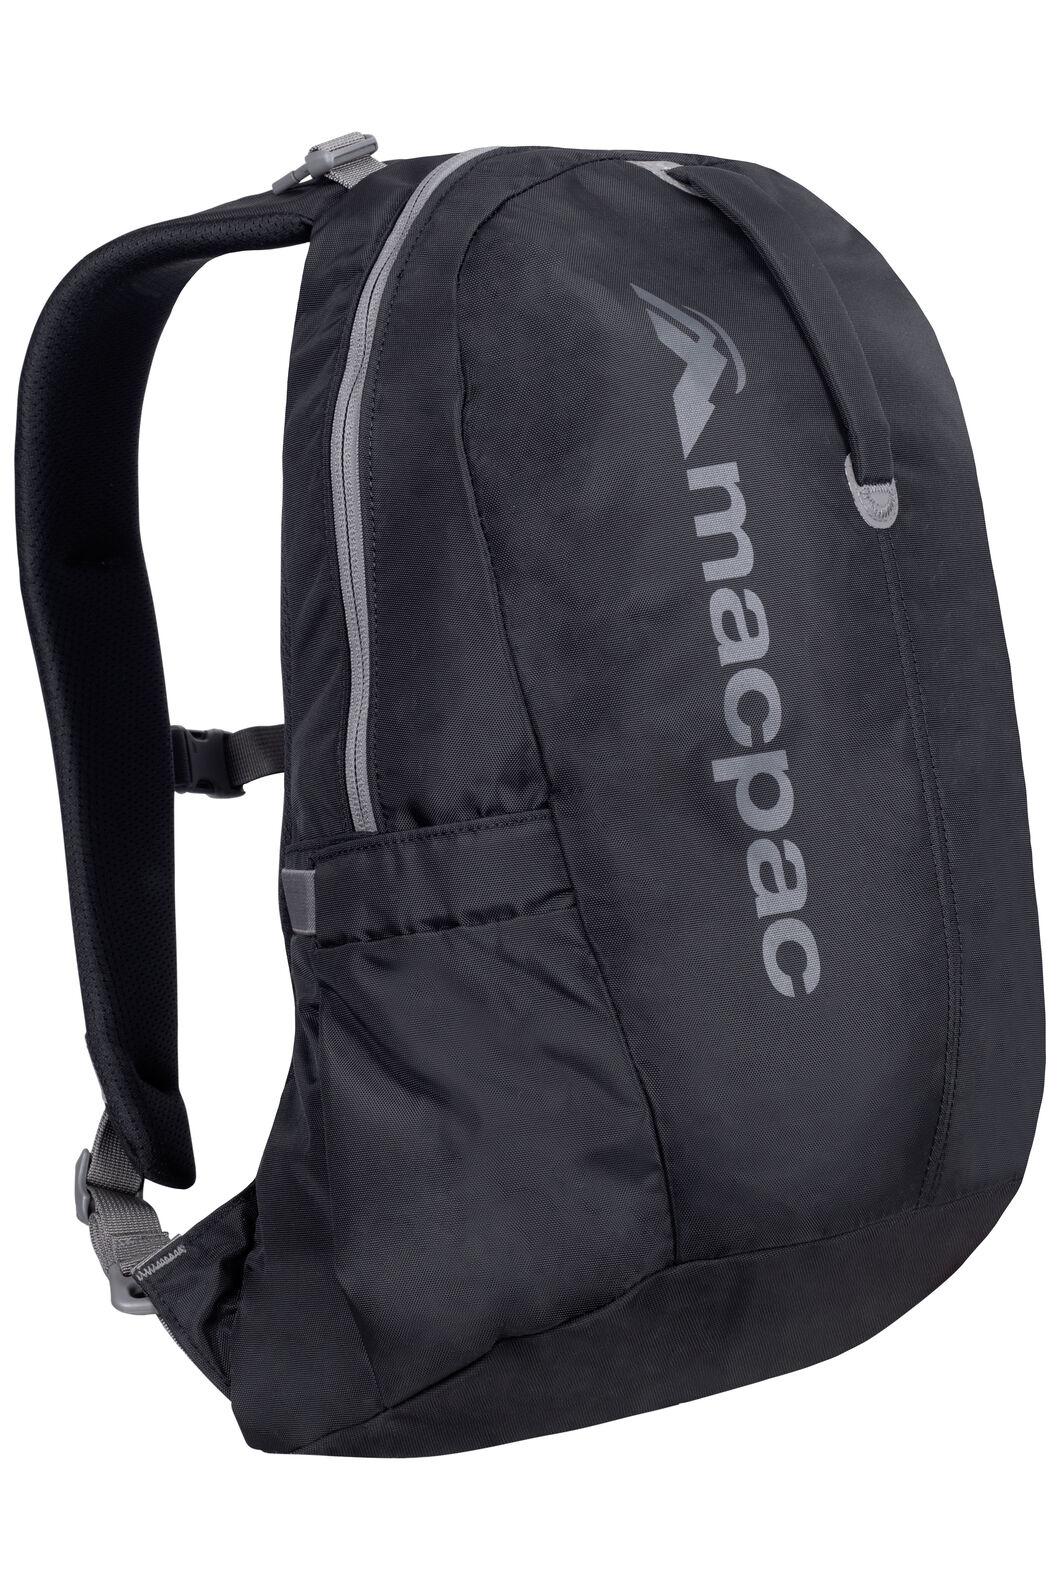 Macpac Limpet 16L Travel Pack, Black, hi-res